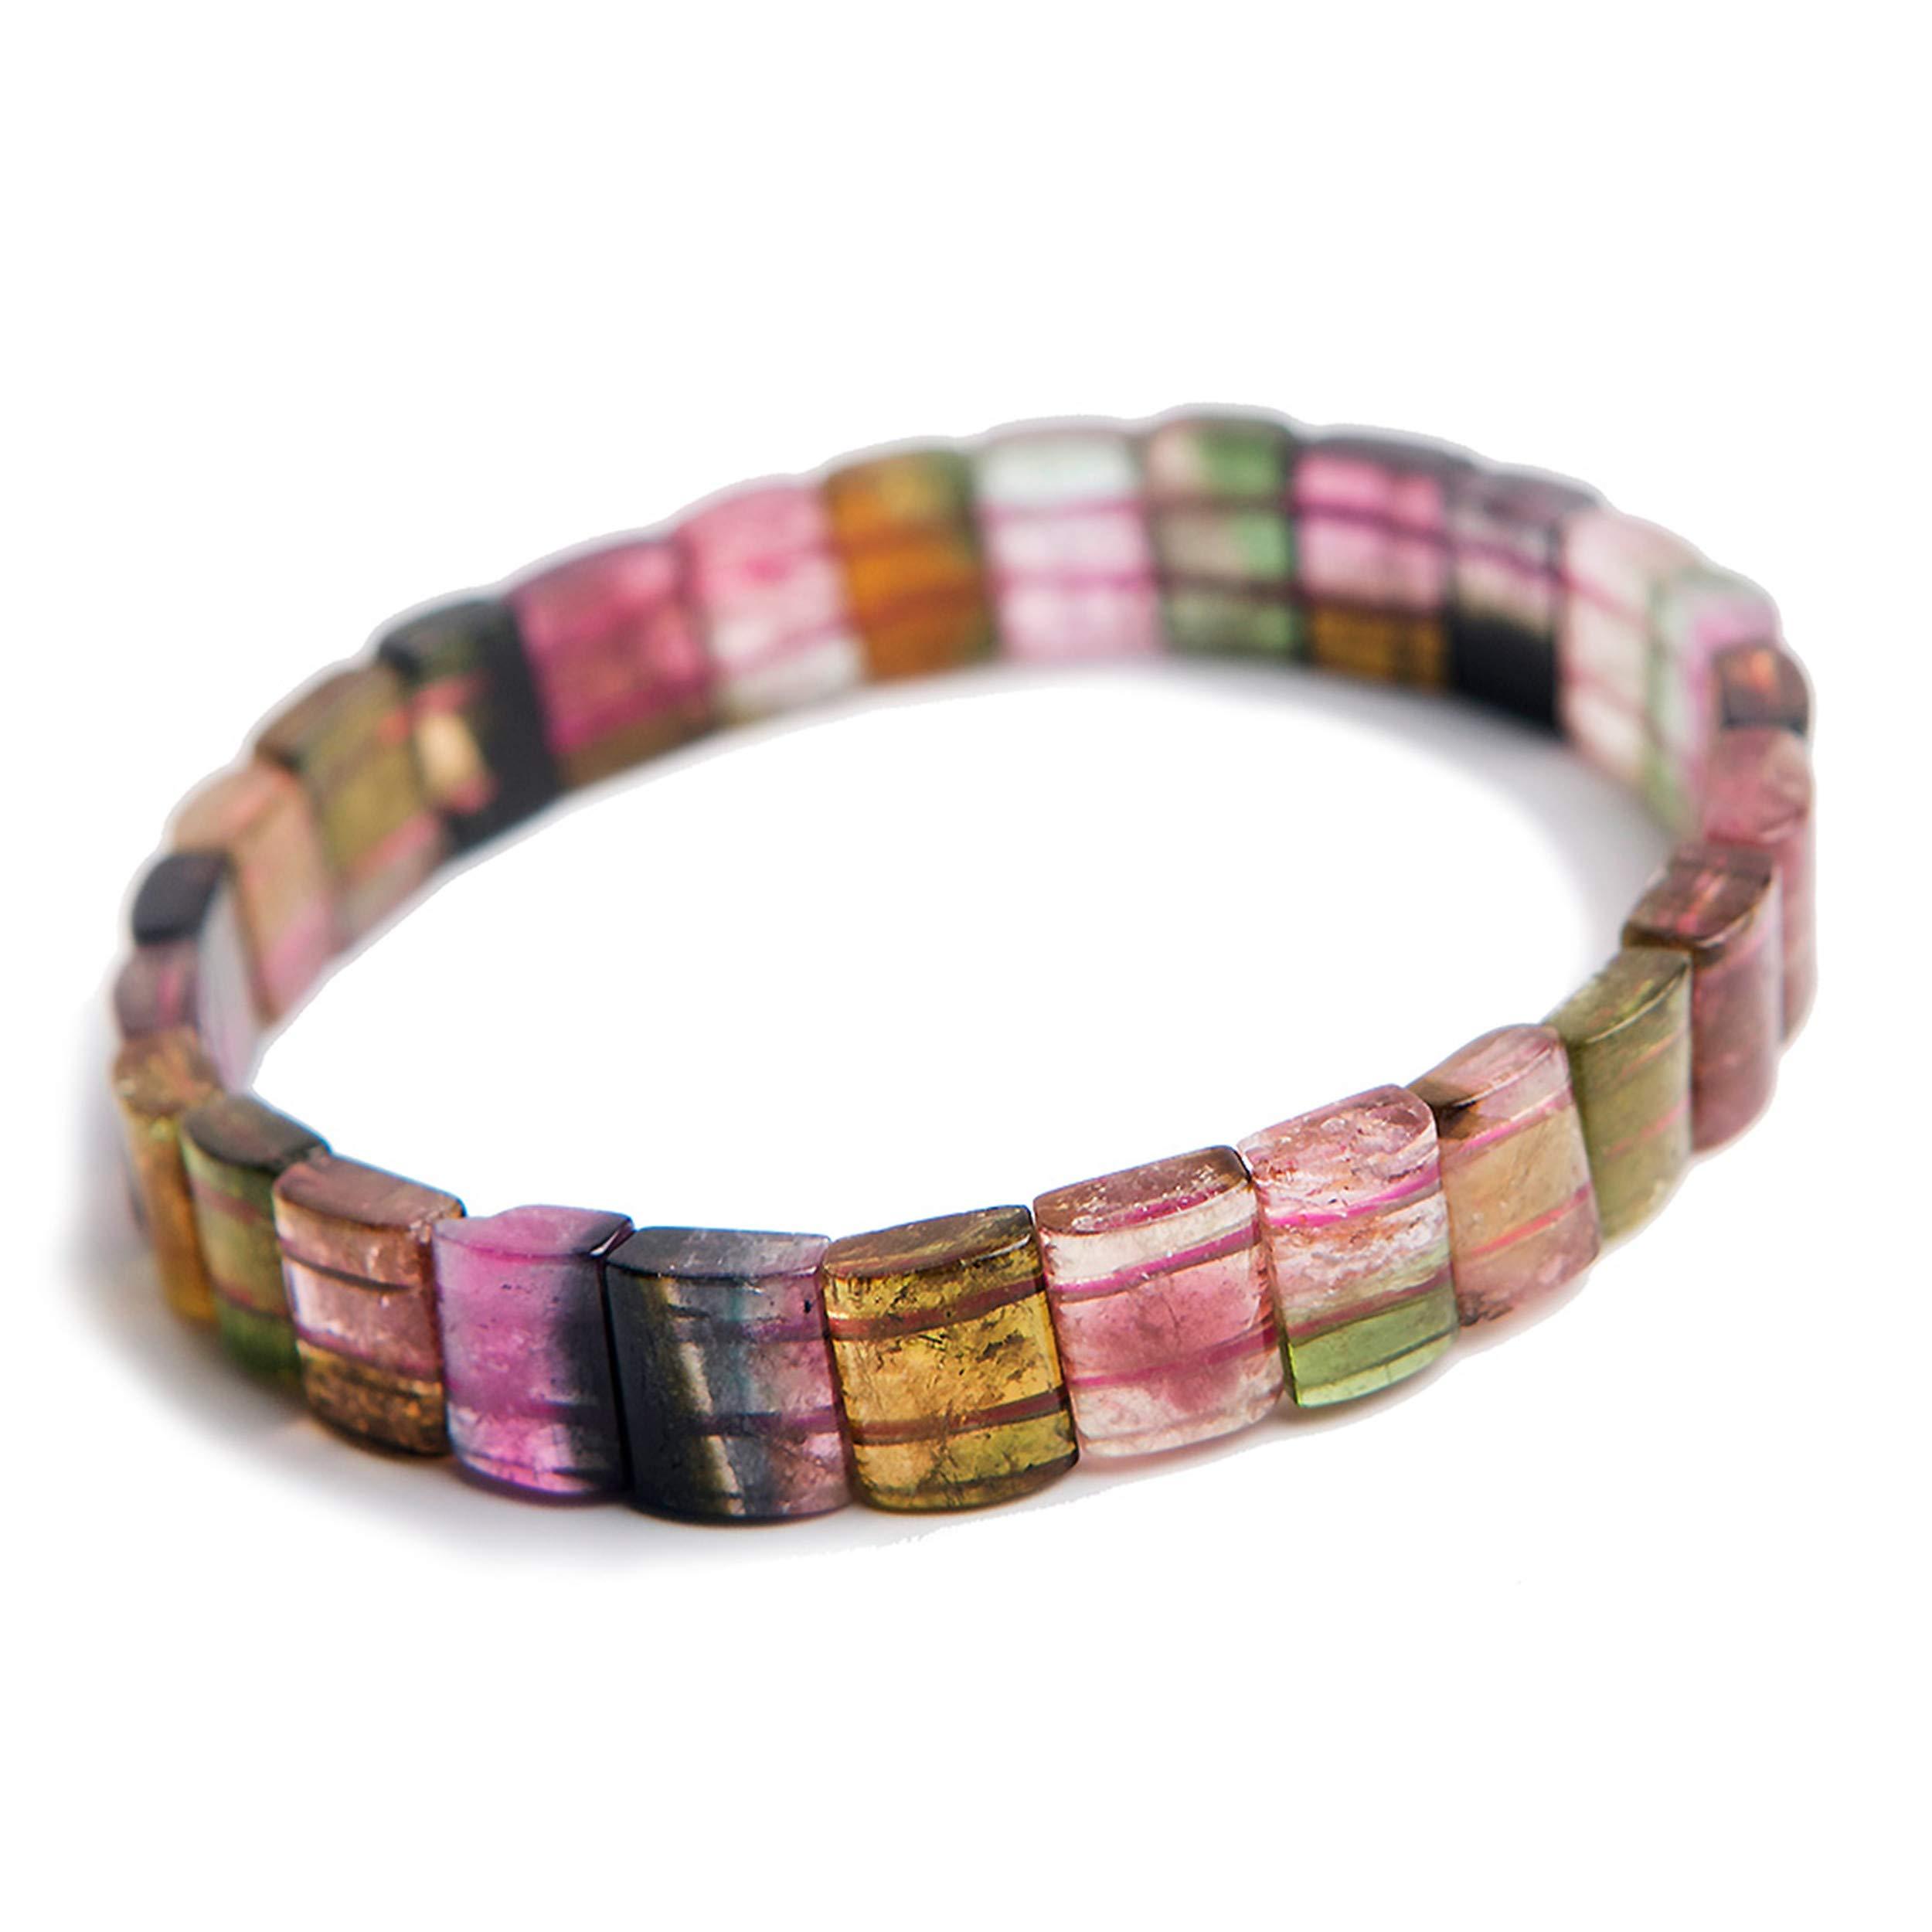 Reikocrystalbeads Genuine Jewelry Bangle Natural Tourmaline Crystal Rectangle Beads Bracelet